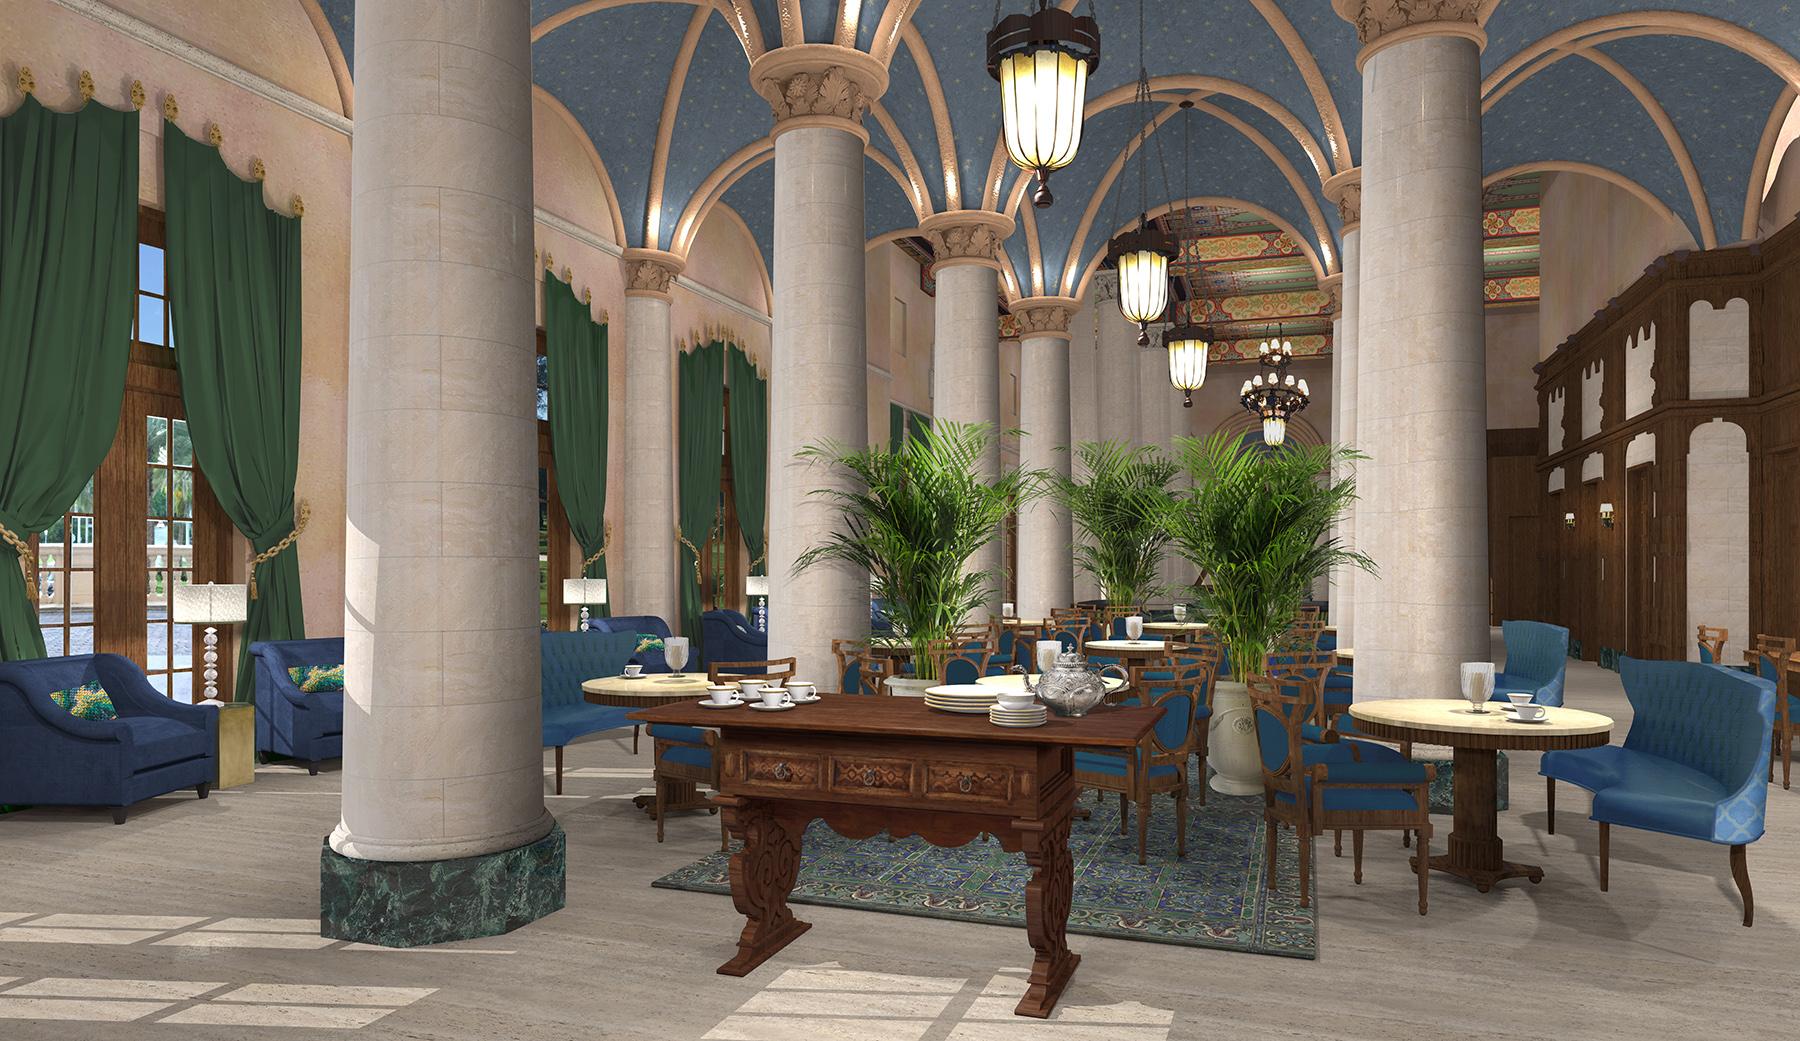 Rendering of The Biltmore Hotel's updated lobby